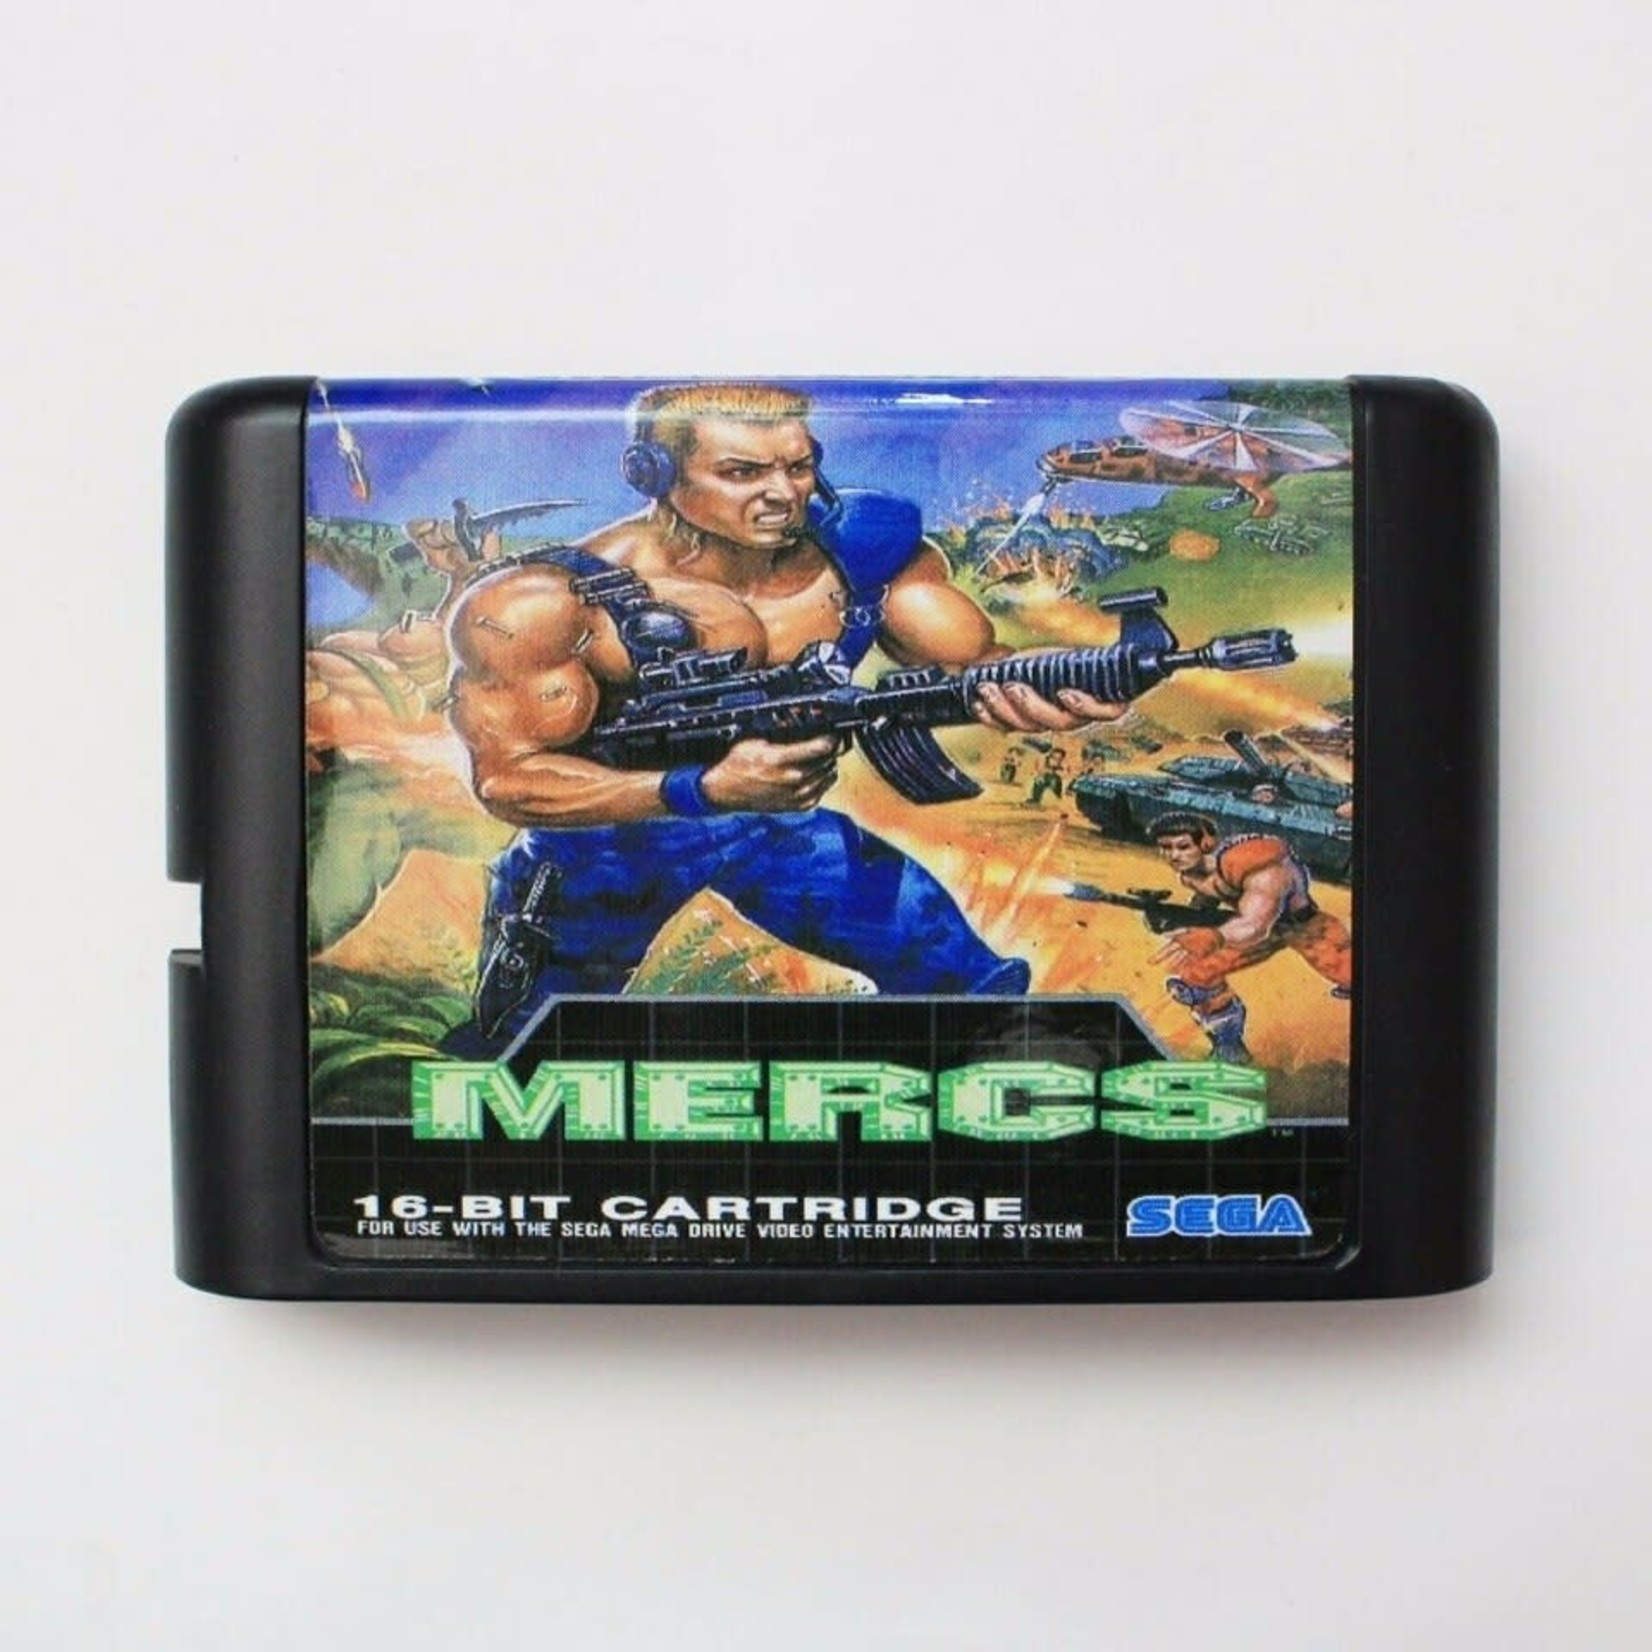 SGU-Mercs (Cartridge)